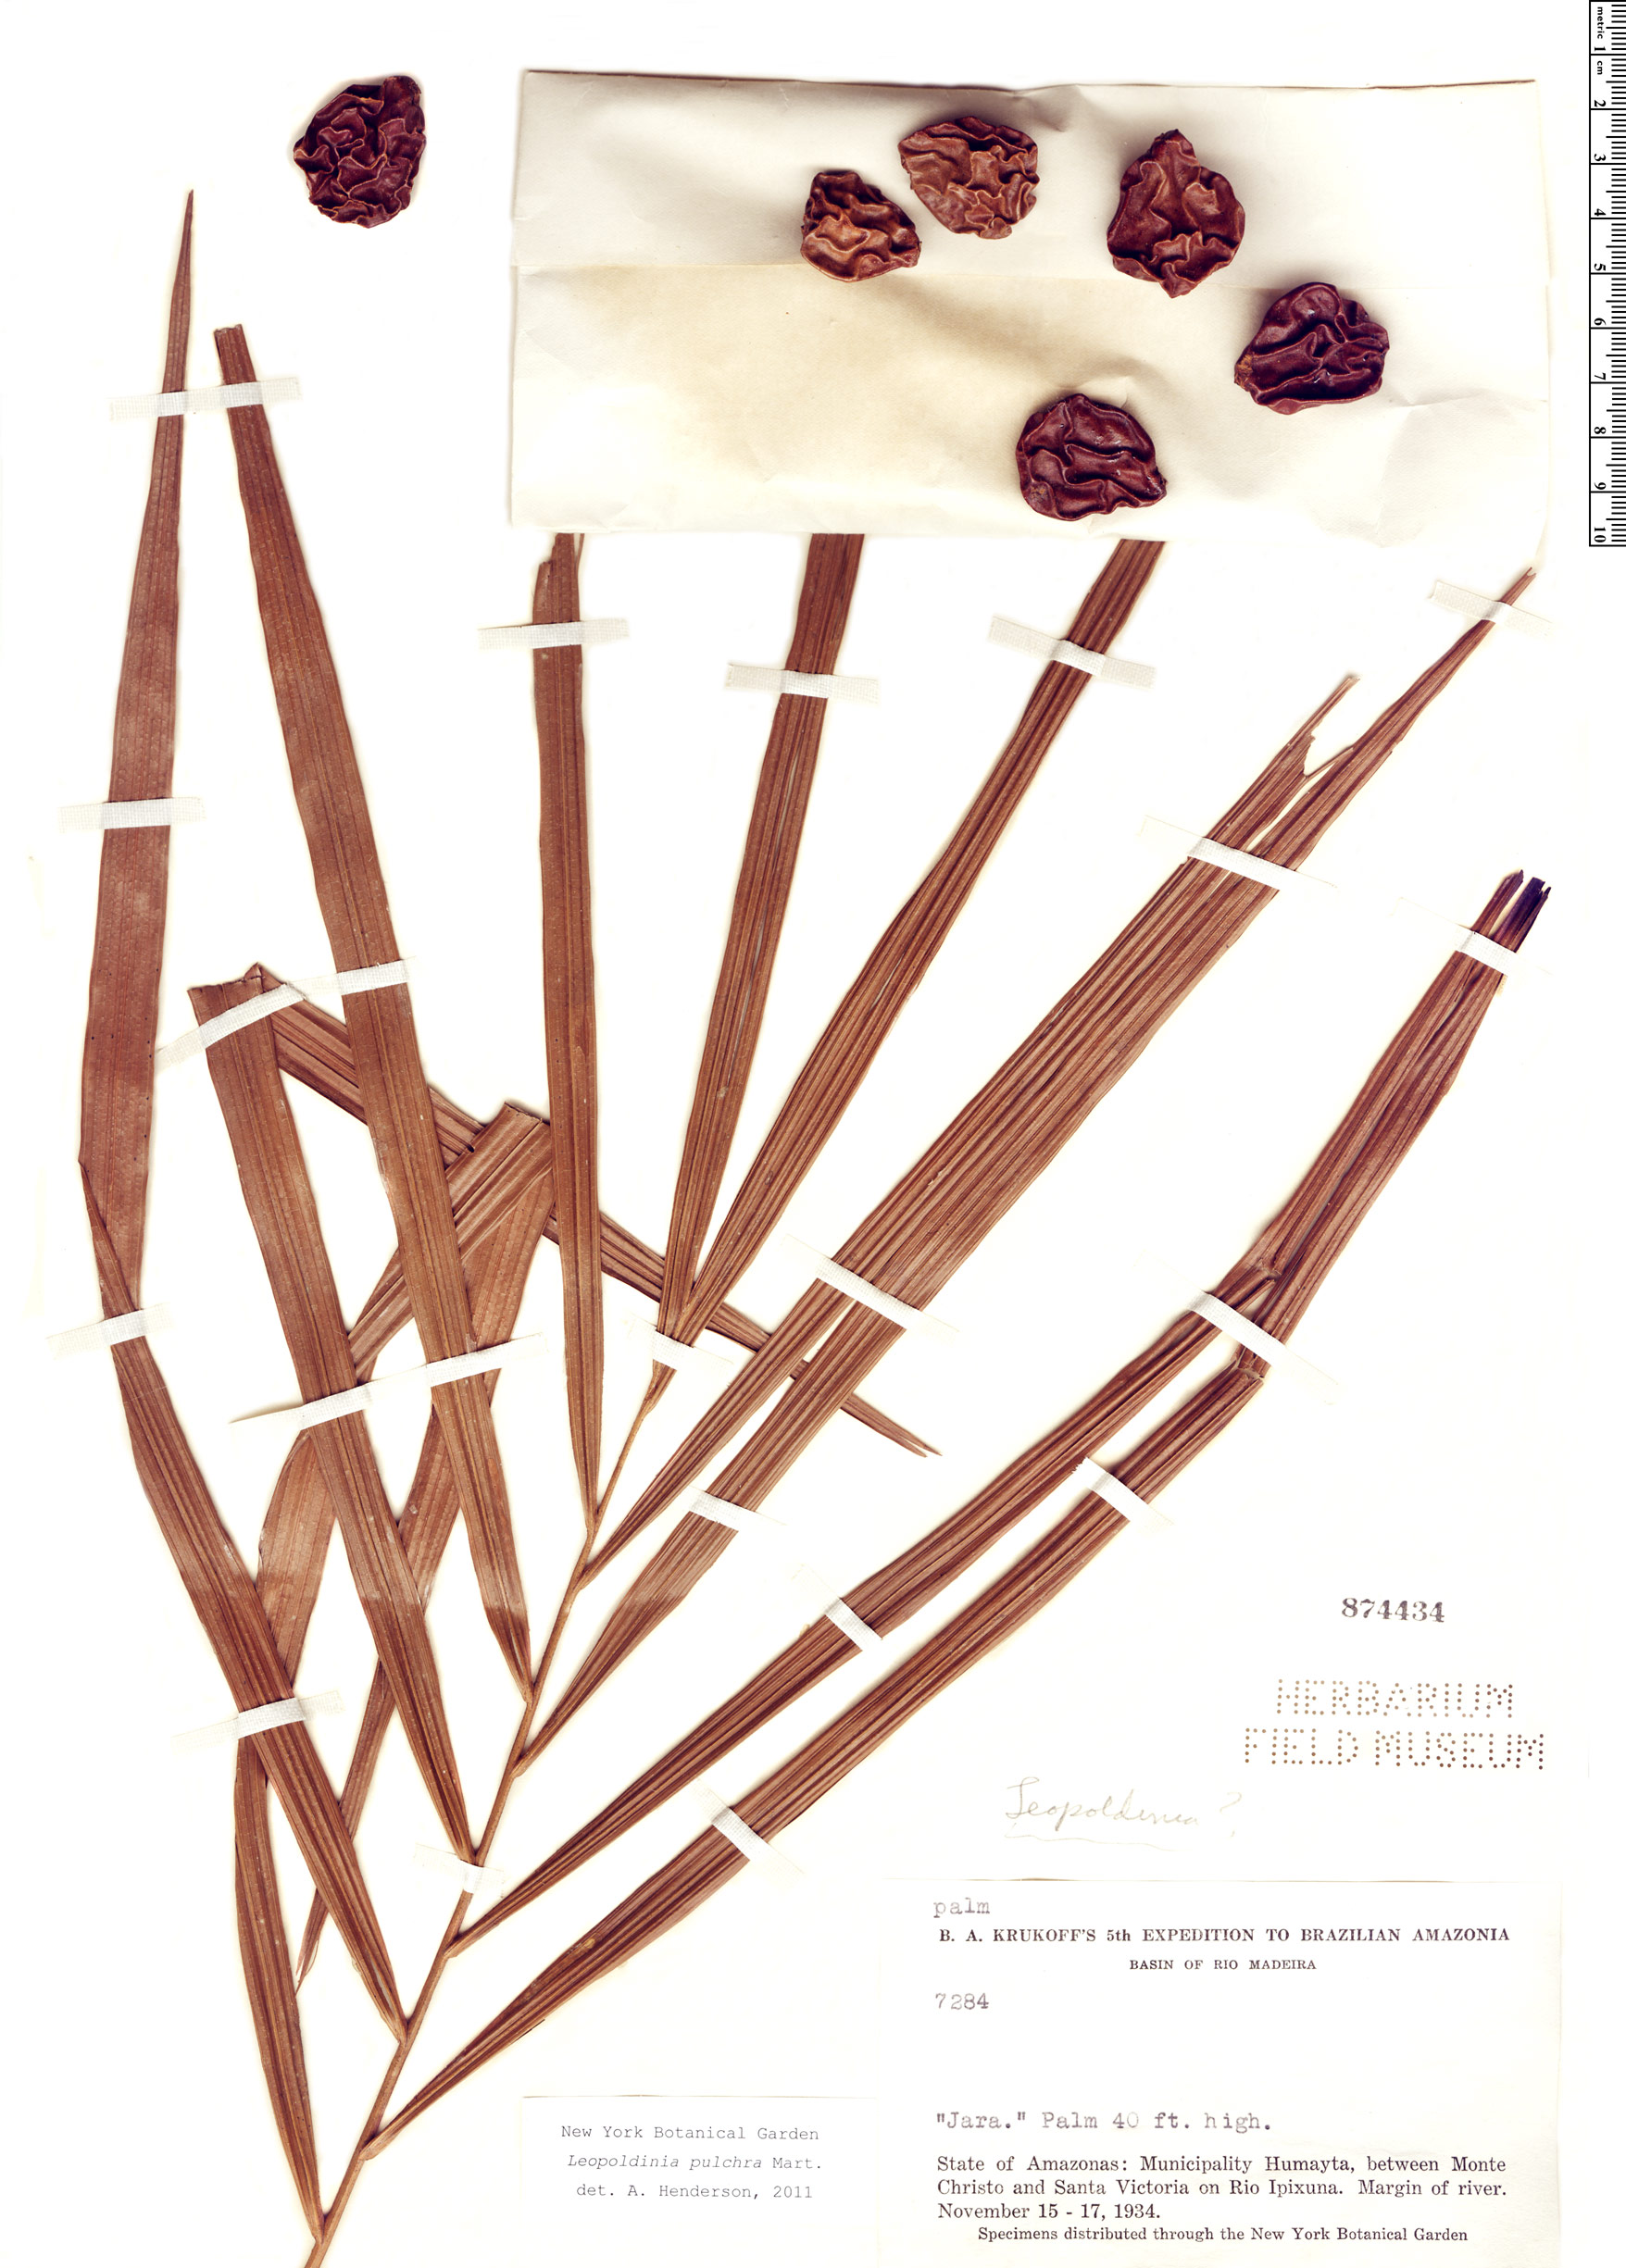 Specimen: Leopoldinia pulchra